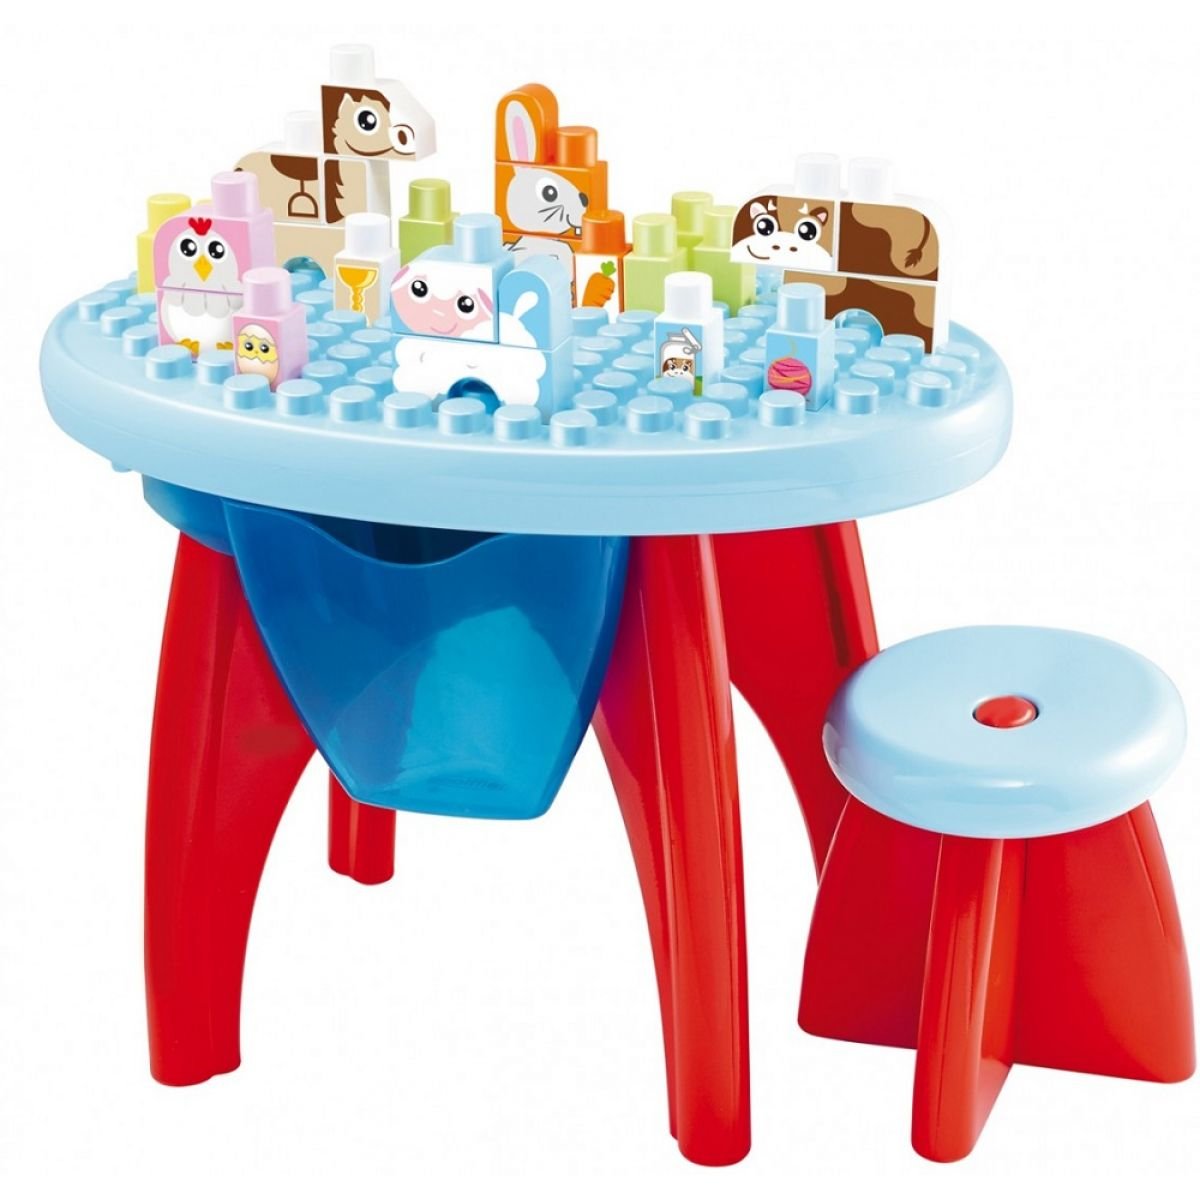 Abrick 7790 Maxi Stôl so stoličkou a kockami